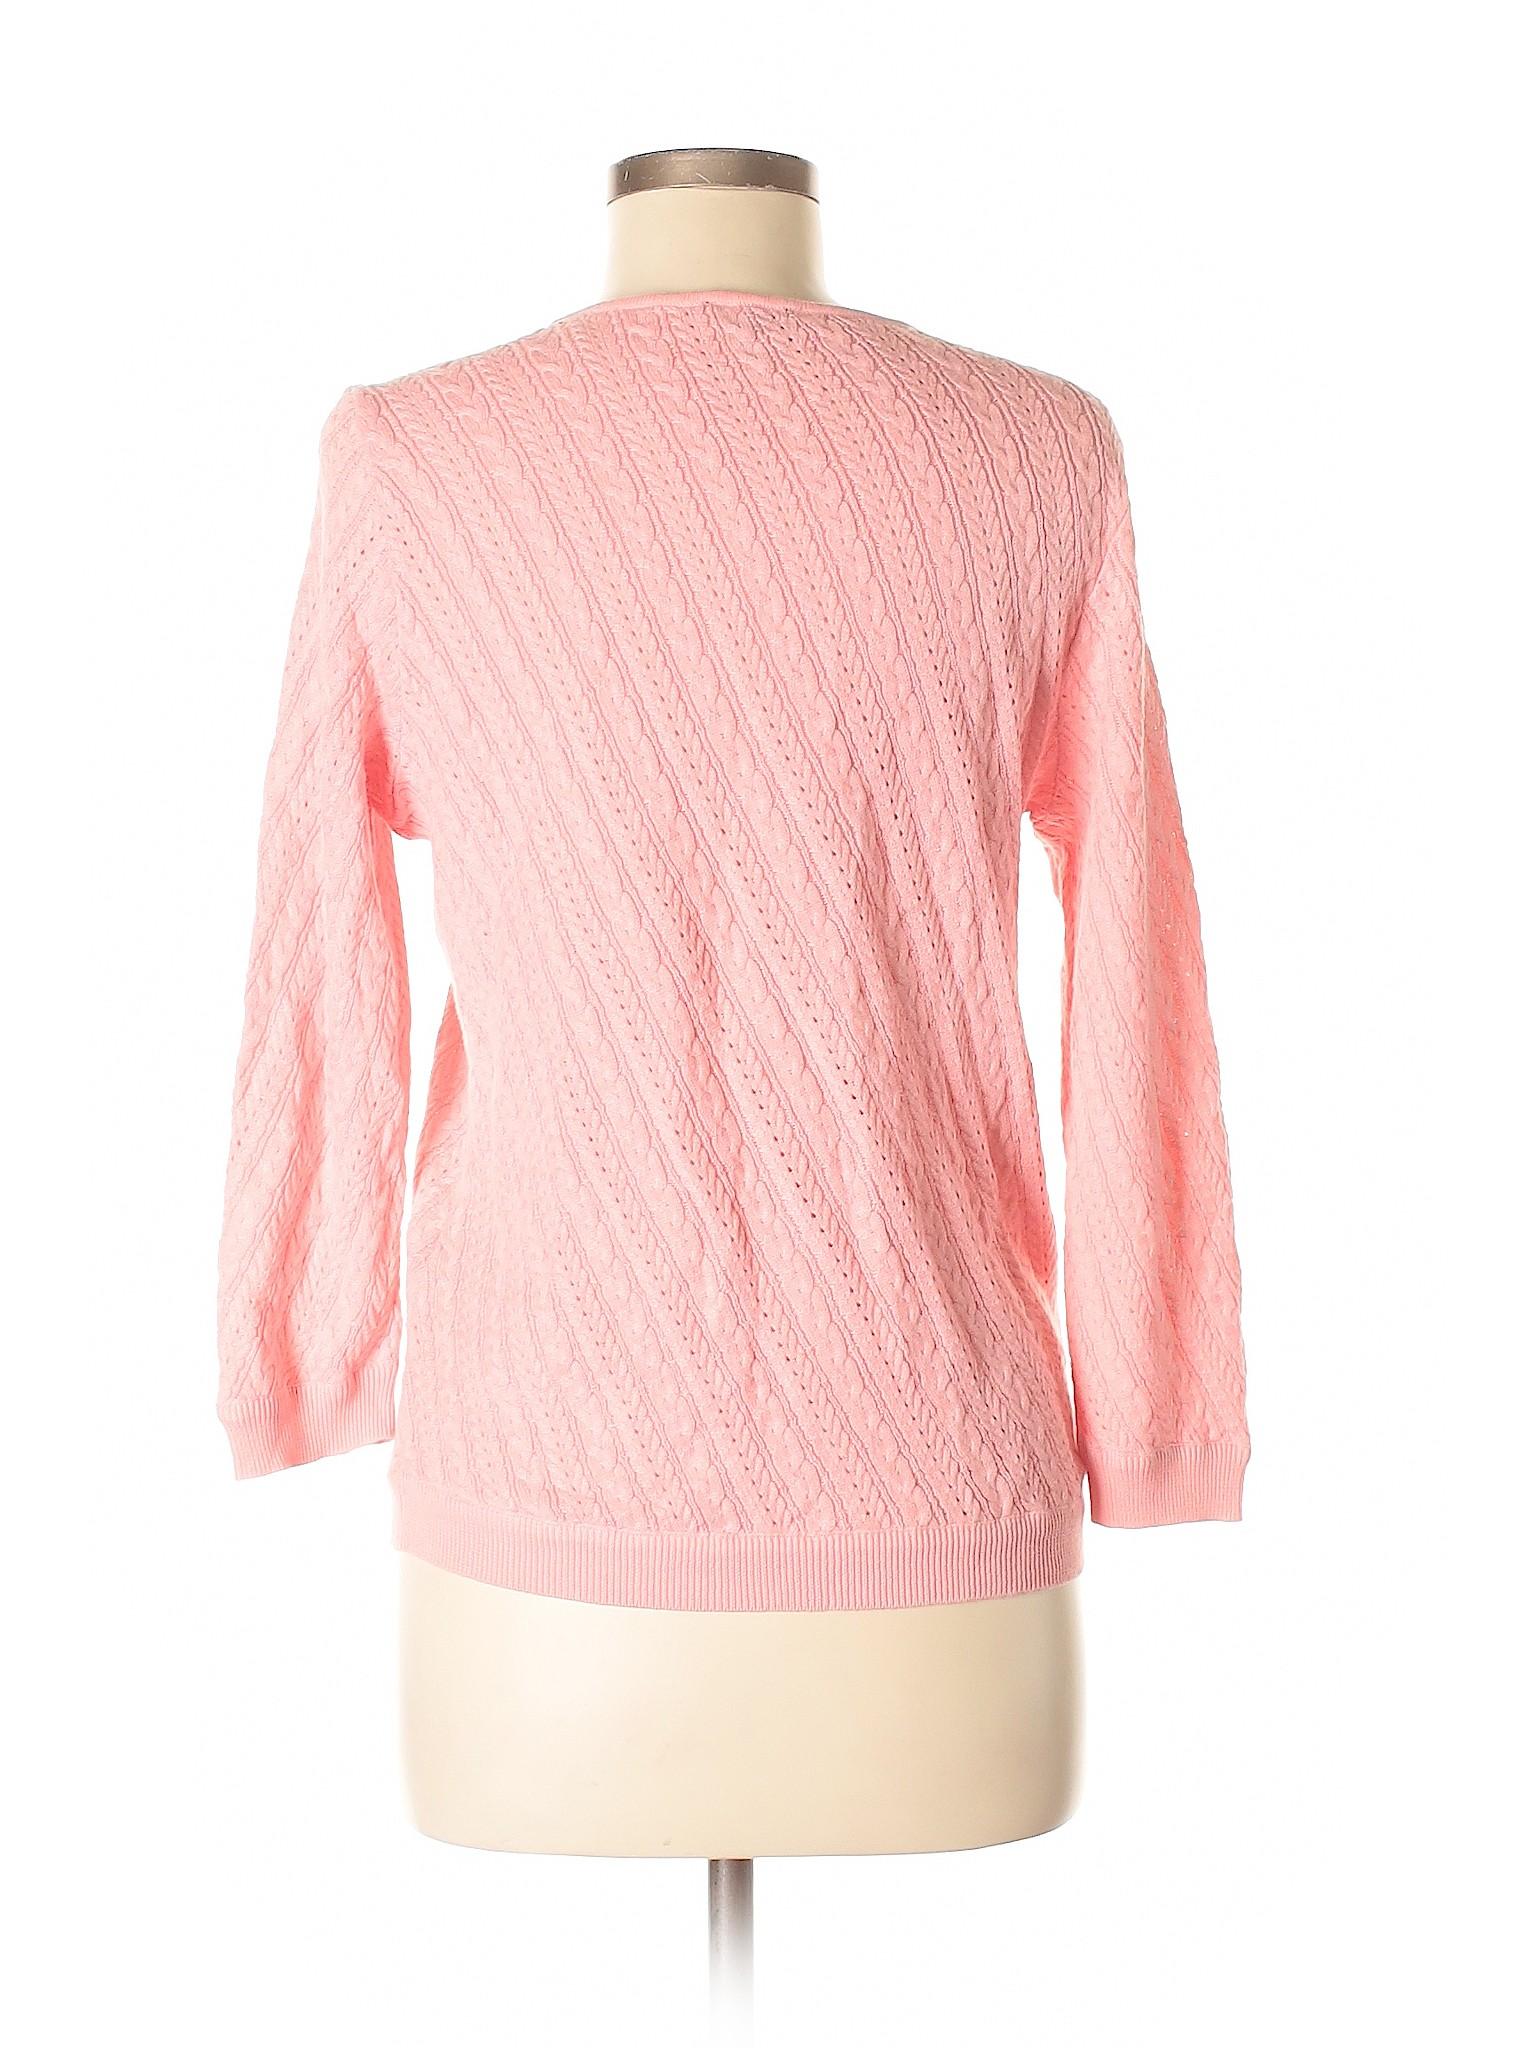 Pullover Boutique Talbots Boutique Talbots Boutique Pullover Sweater Sweater Talbots Pullover IqfWcfwtE